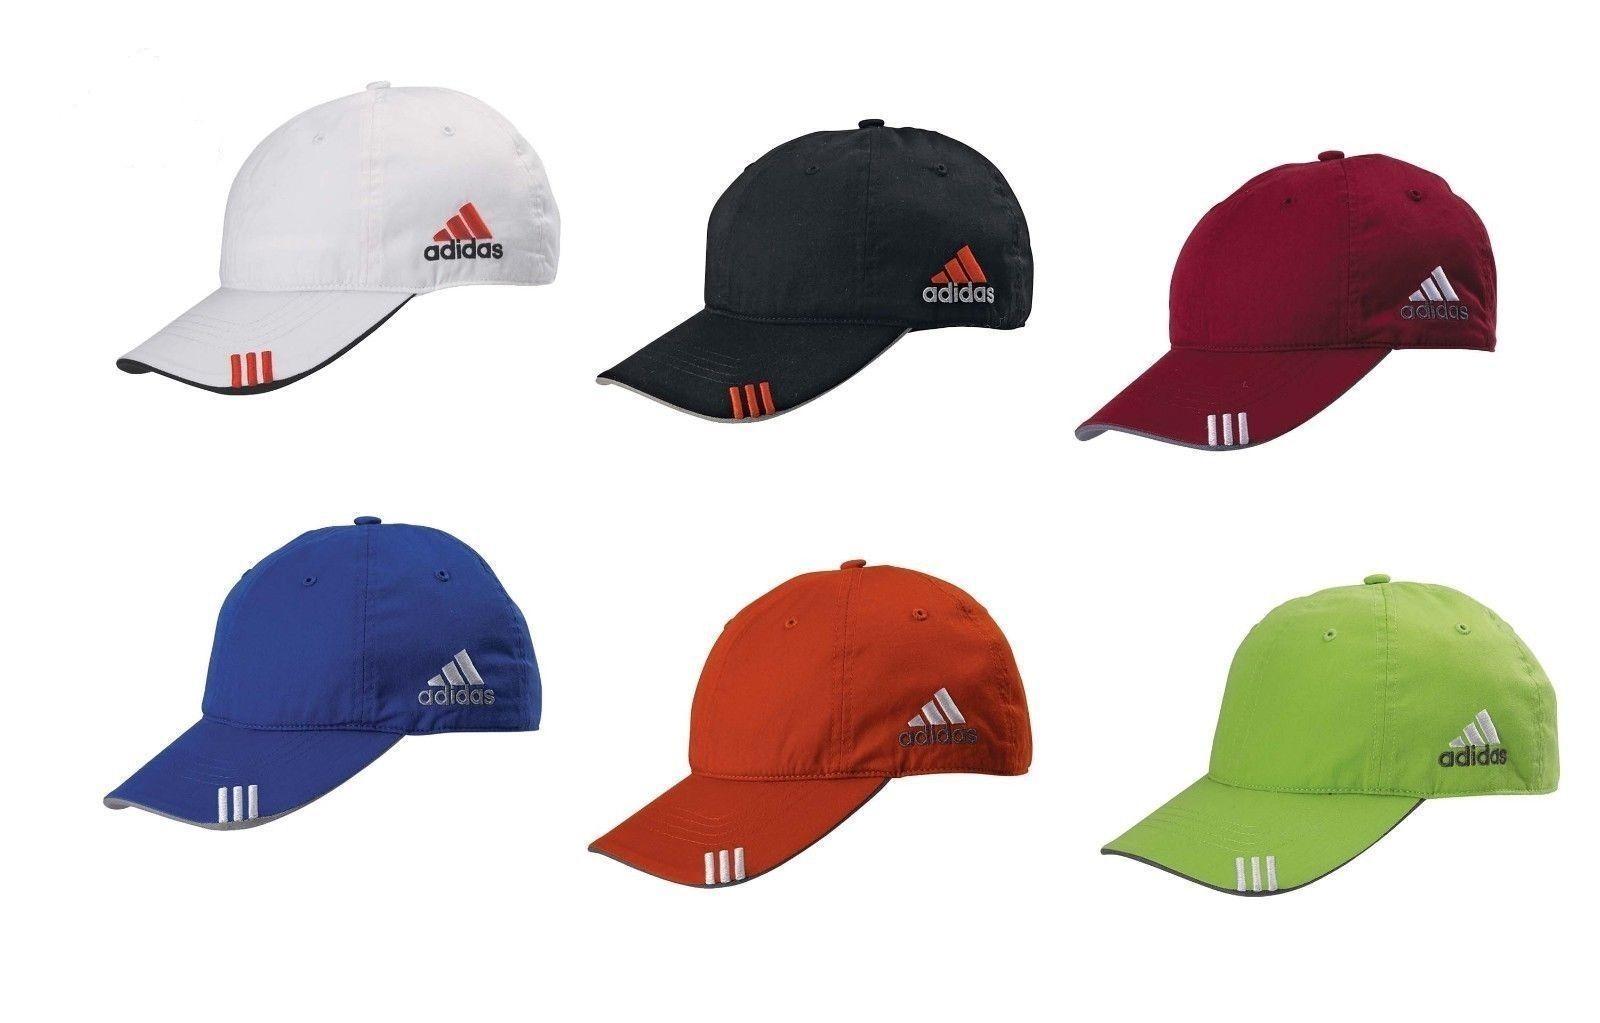 Adidas Golf Men's Adjustable Baseball Cap Unstructured Hat Unisex Size 13  Colors